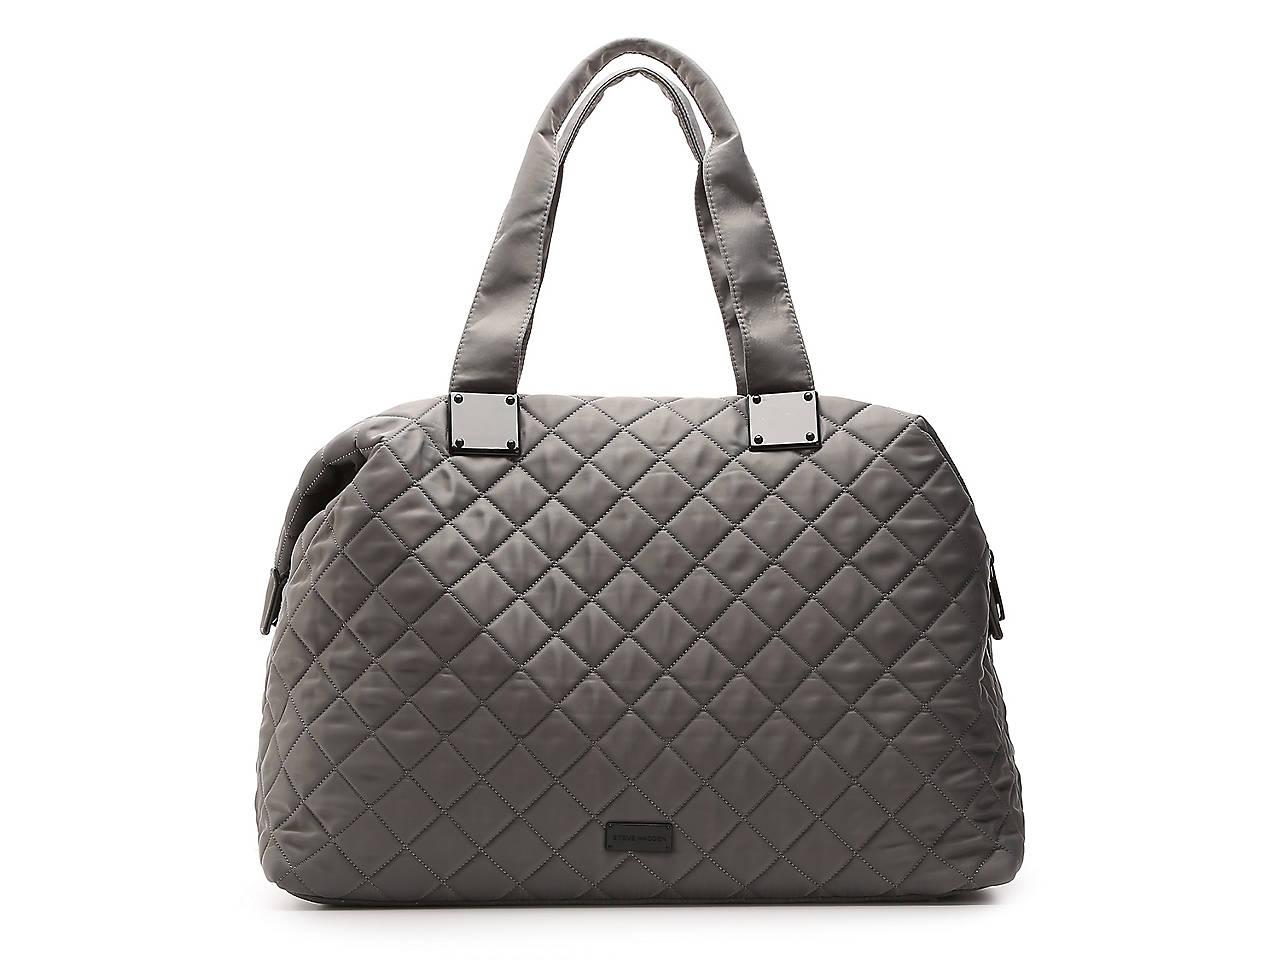 34500595935 Steve Madden Quilted Weekender Bag Women s Handbags   Accessories